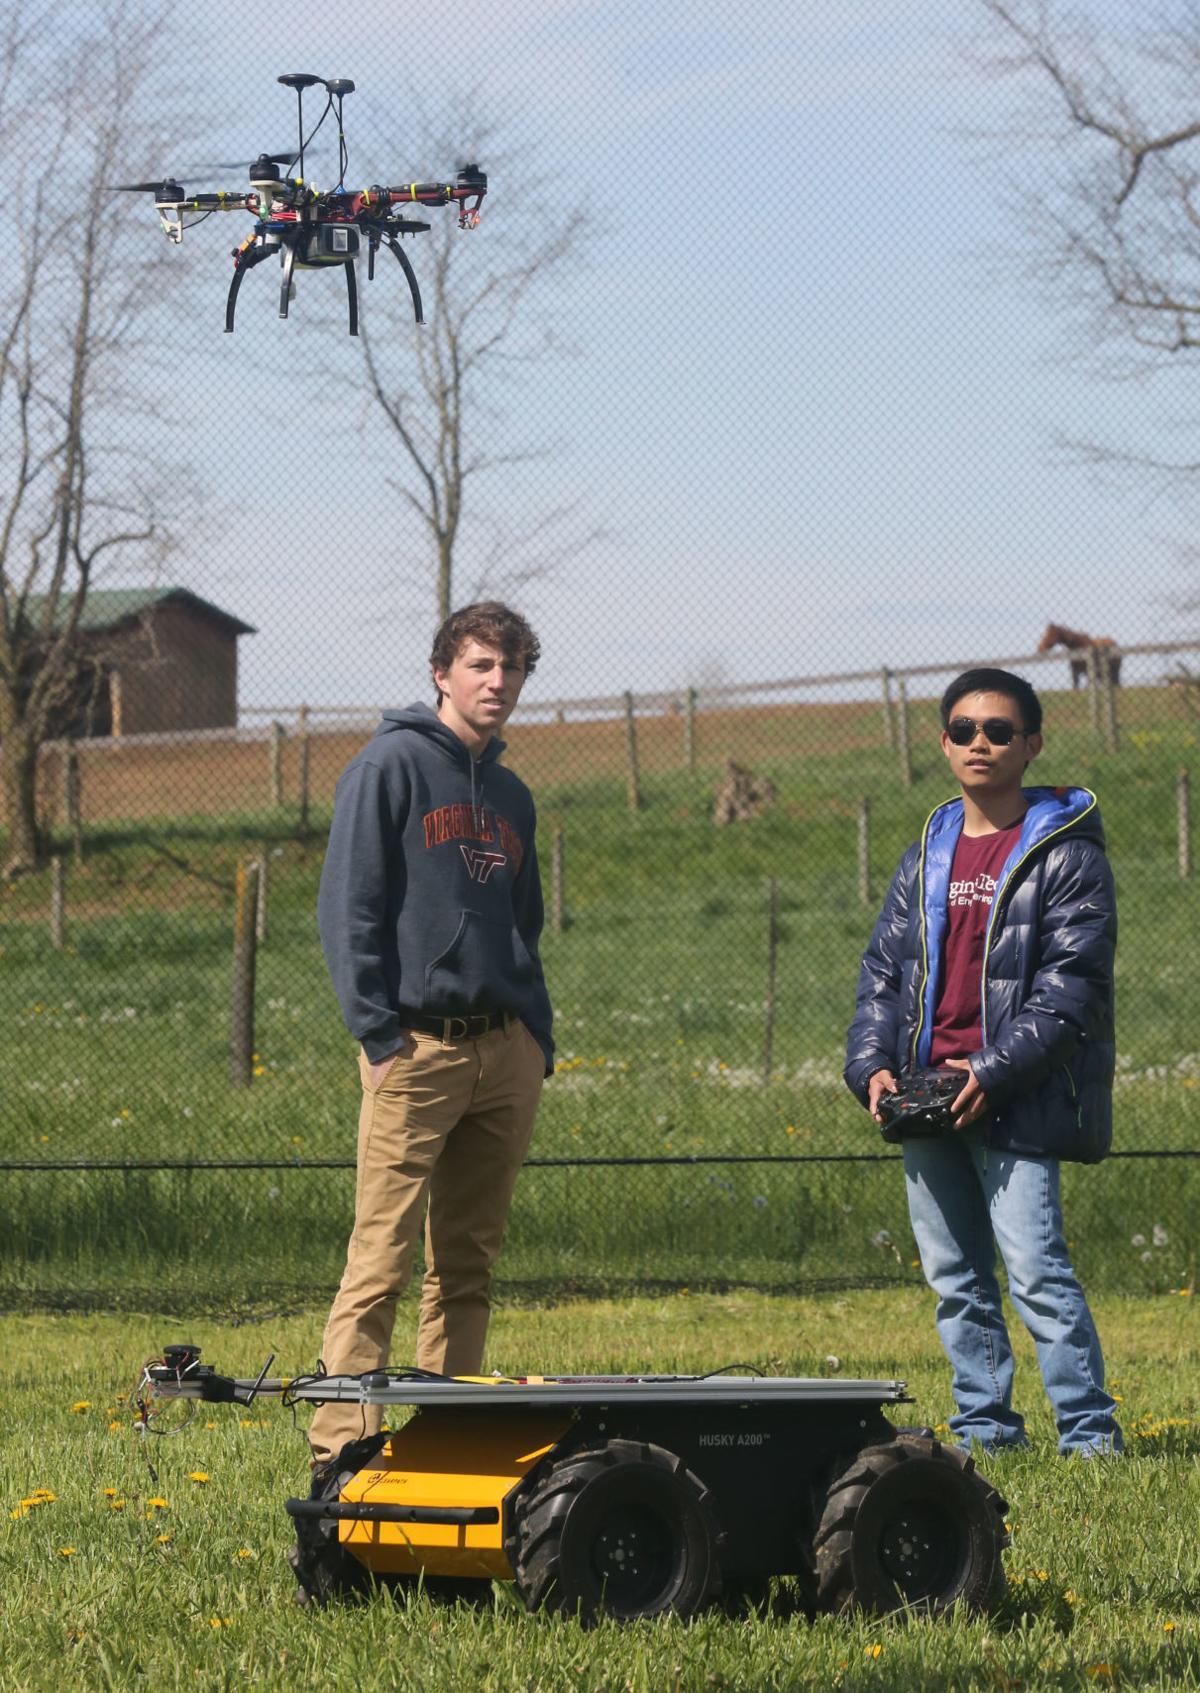 mg vt drone park 042618 (copy)